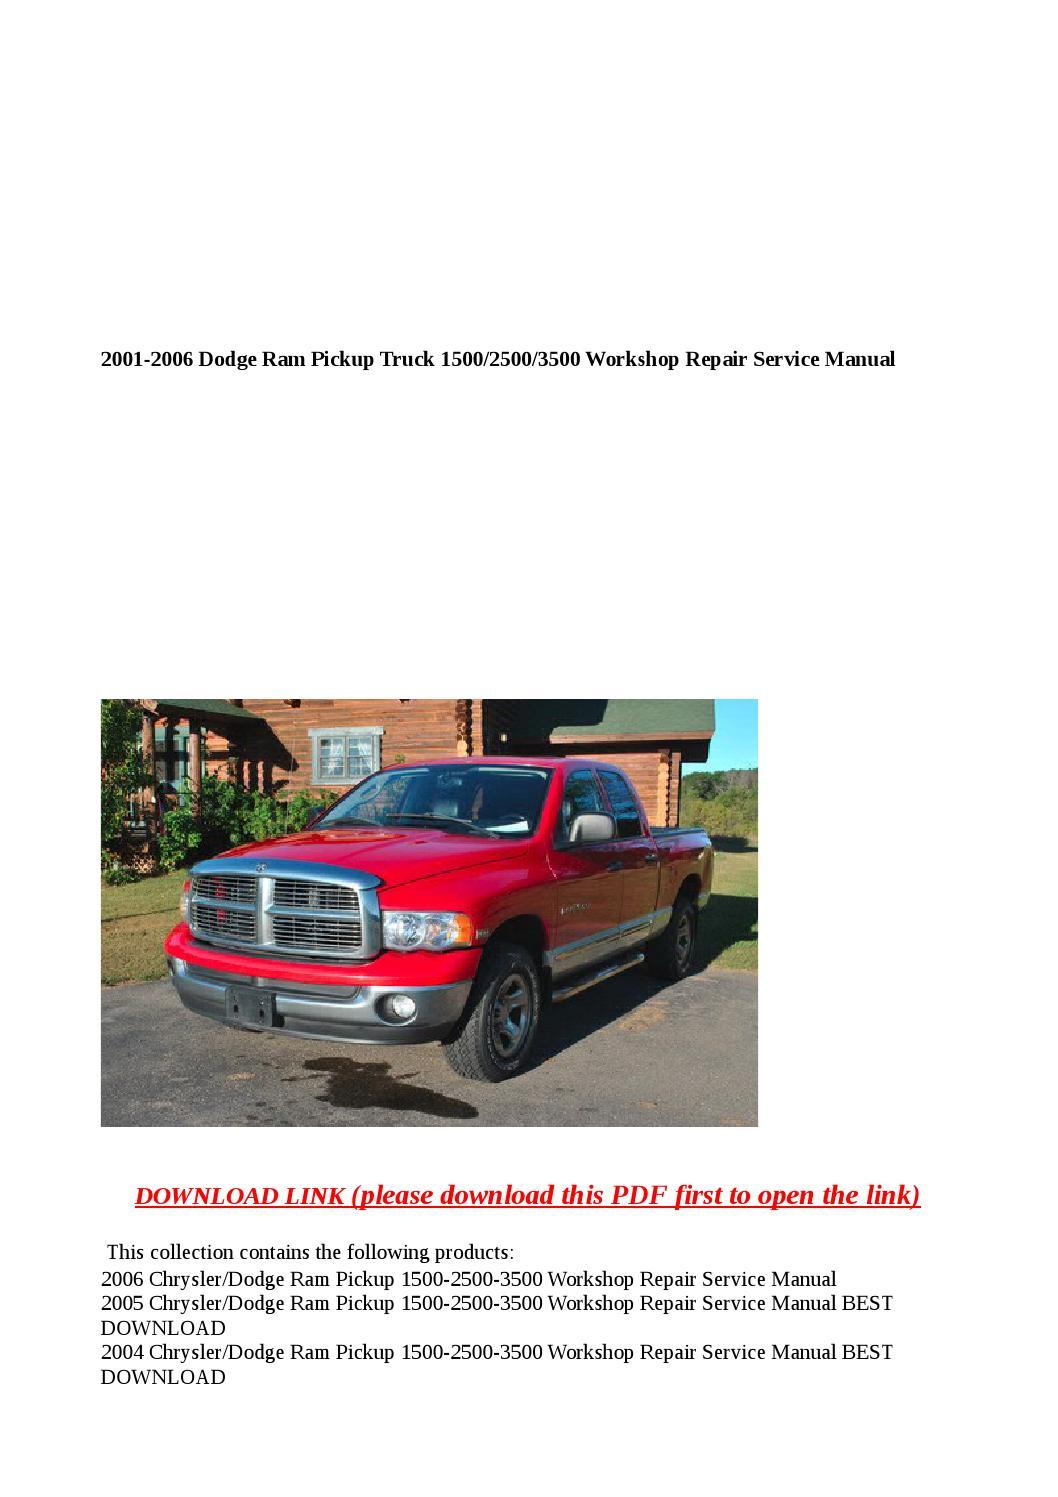 2014 ram 2500 service manual